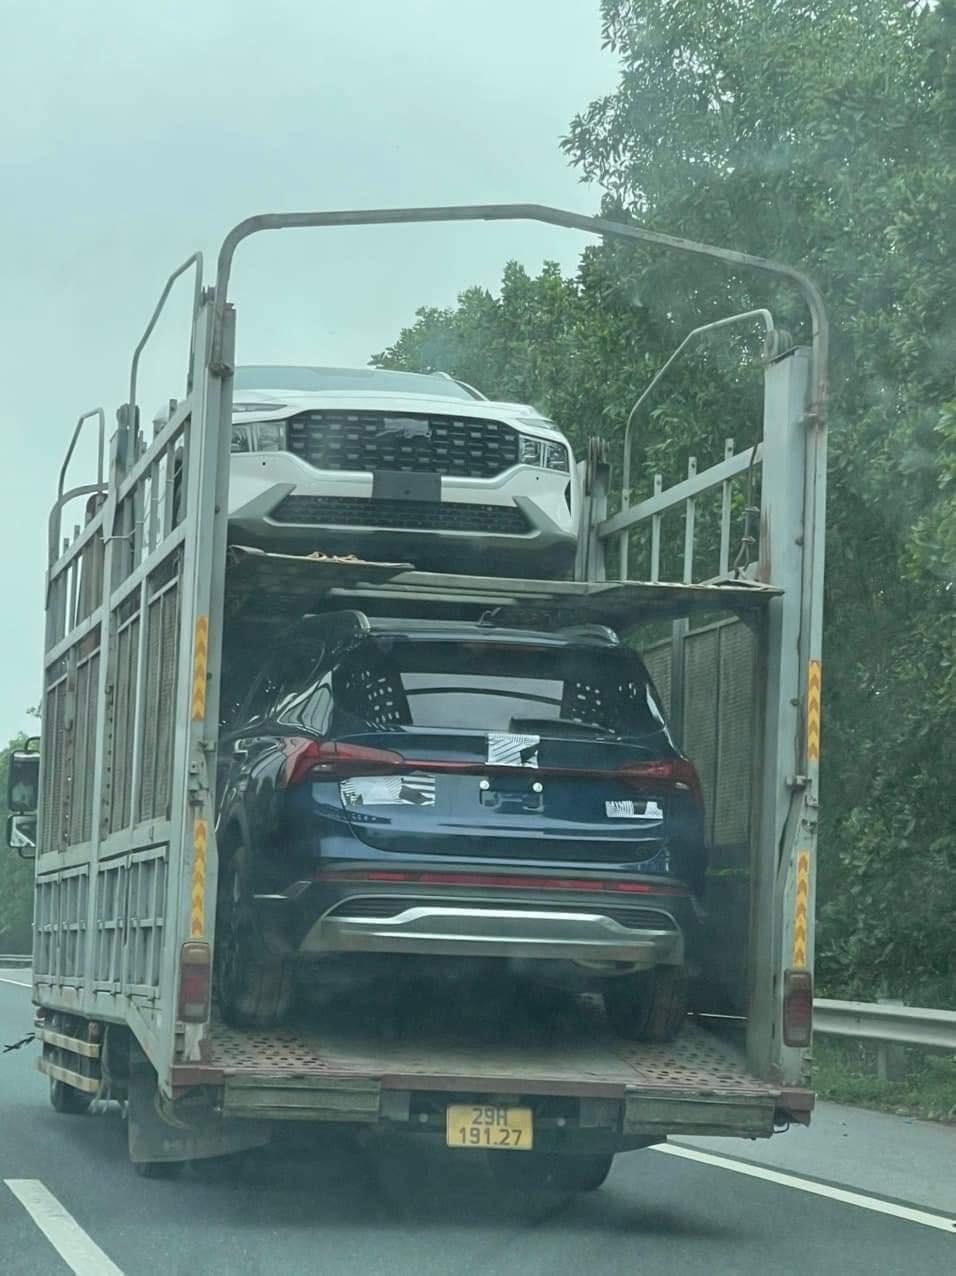 Hyundai Santa Fe 2021 tiếp tục lộ ảnh tại Việt Nam, ngày ra mắt sắp cận kề? hyundai-santa-fe-1.jpg